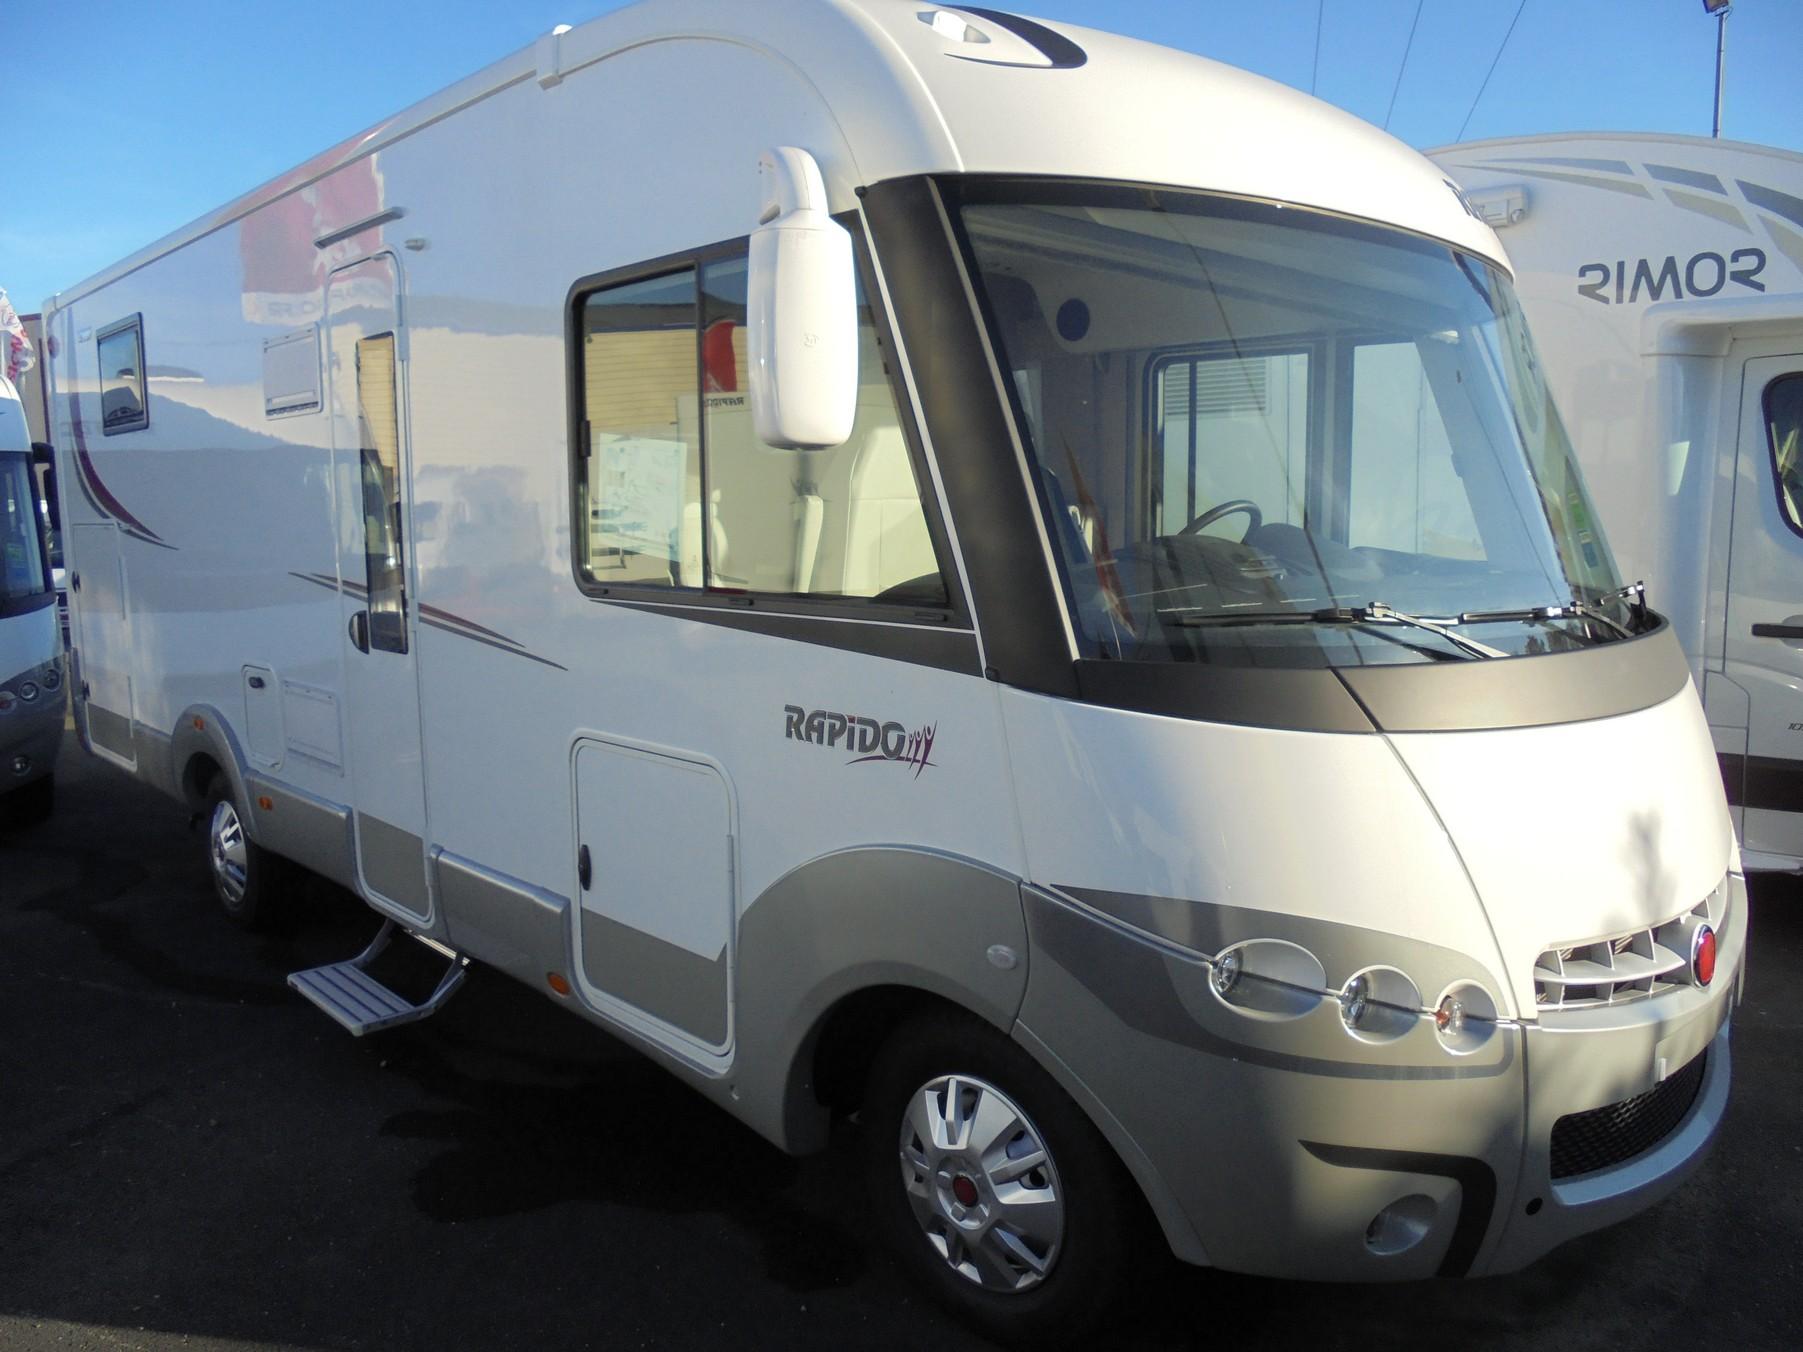 rapido 890 f neuf fiat camping car en vente treillieres loire atlantique 44. Black Bedroom Furniture Sets. Home Design Ideas